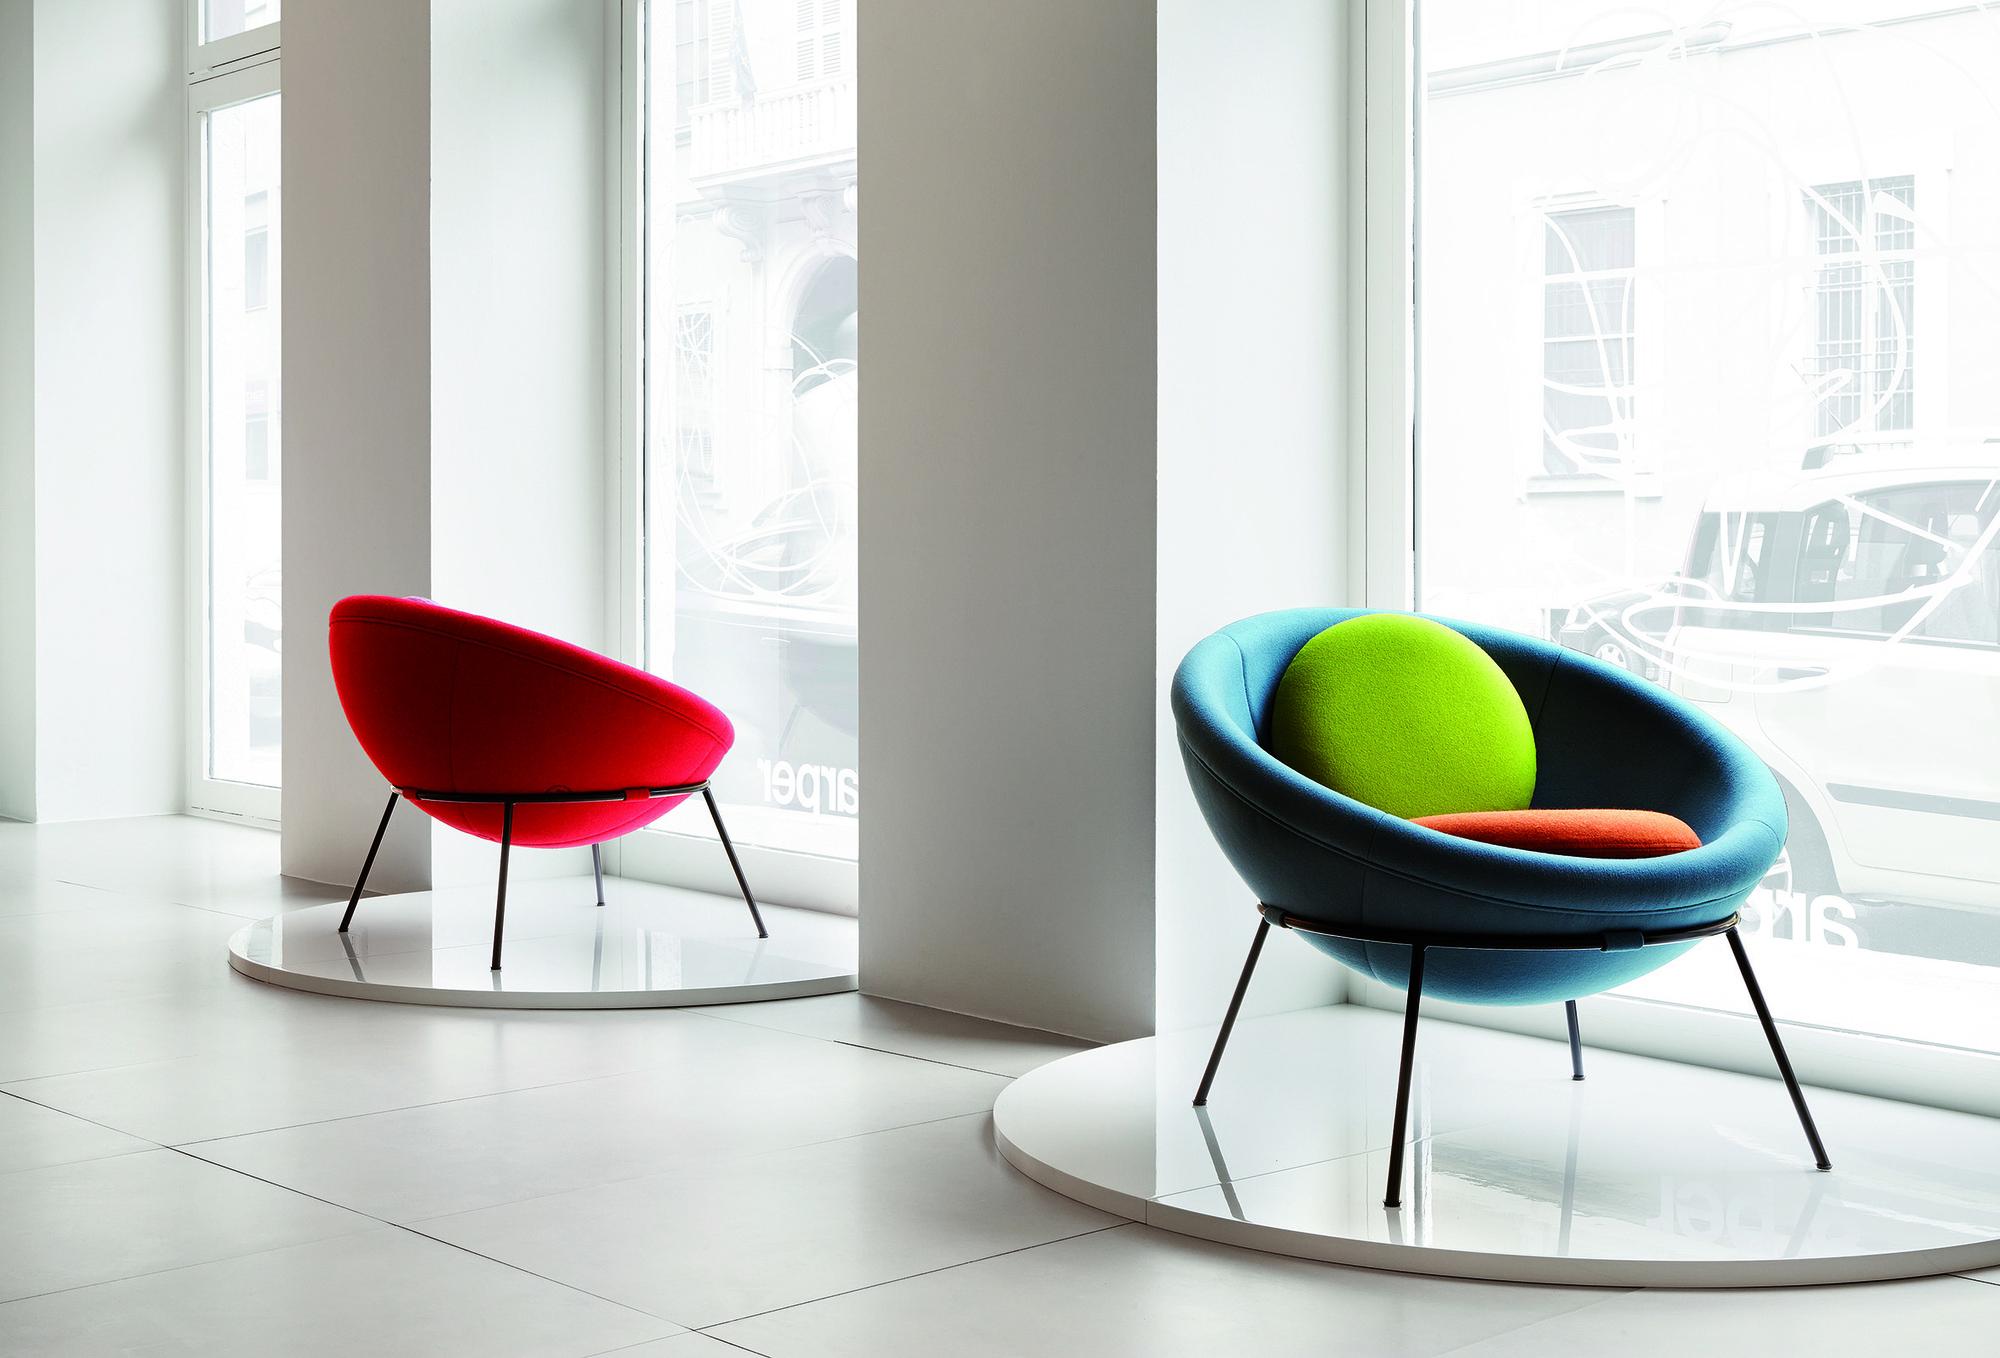 Bardi 39 s bowl chair for Lina bo bardi bowl